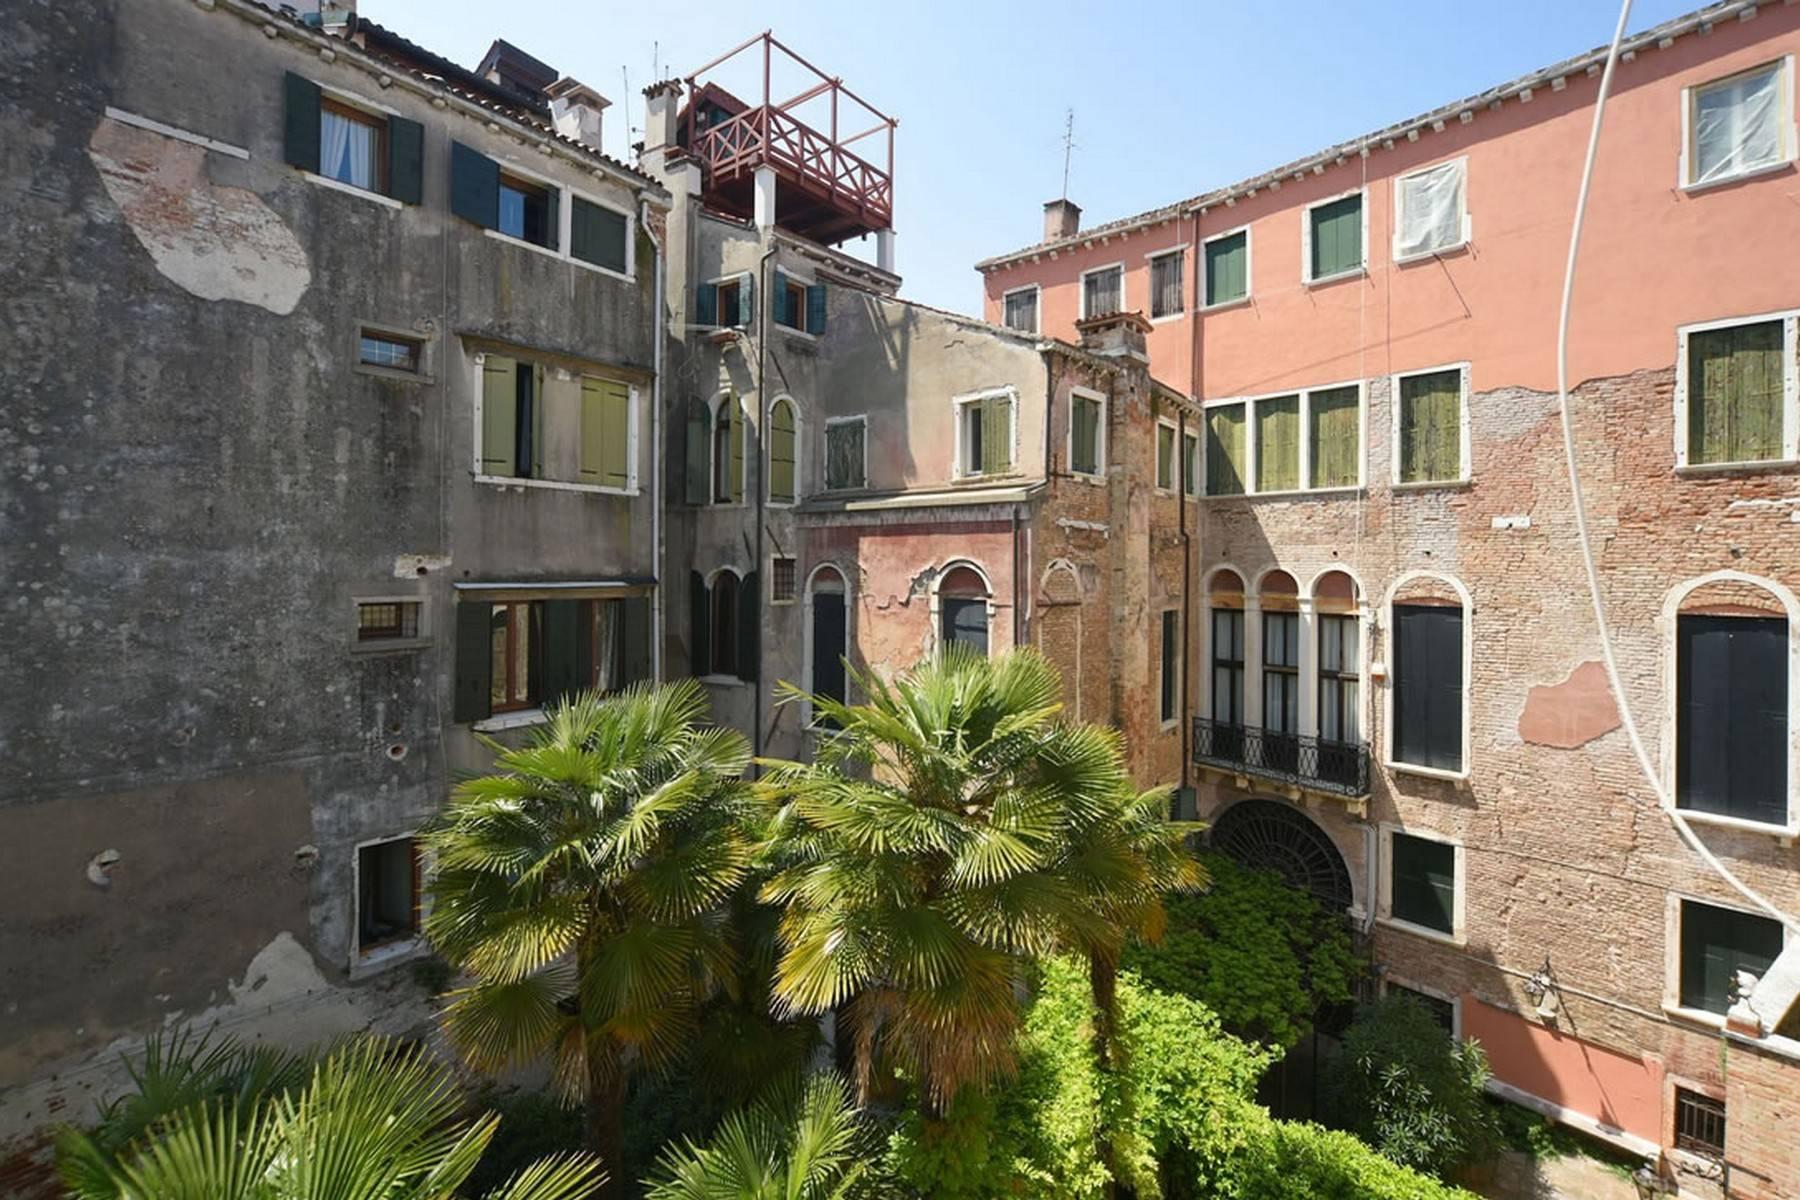 Appartement de design dans le Palazzo Querini Stampalia / S.M. Formosa - 3